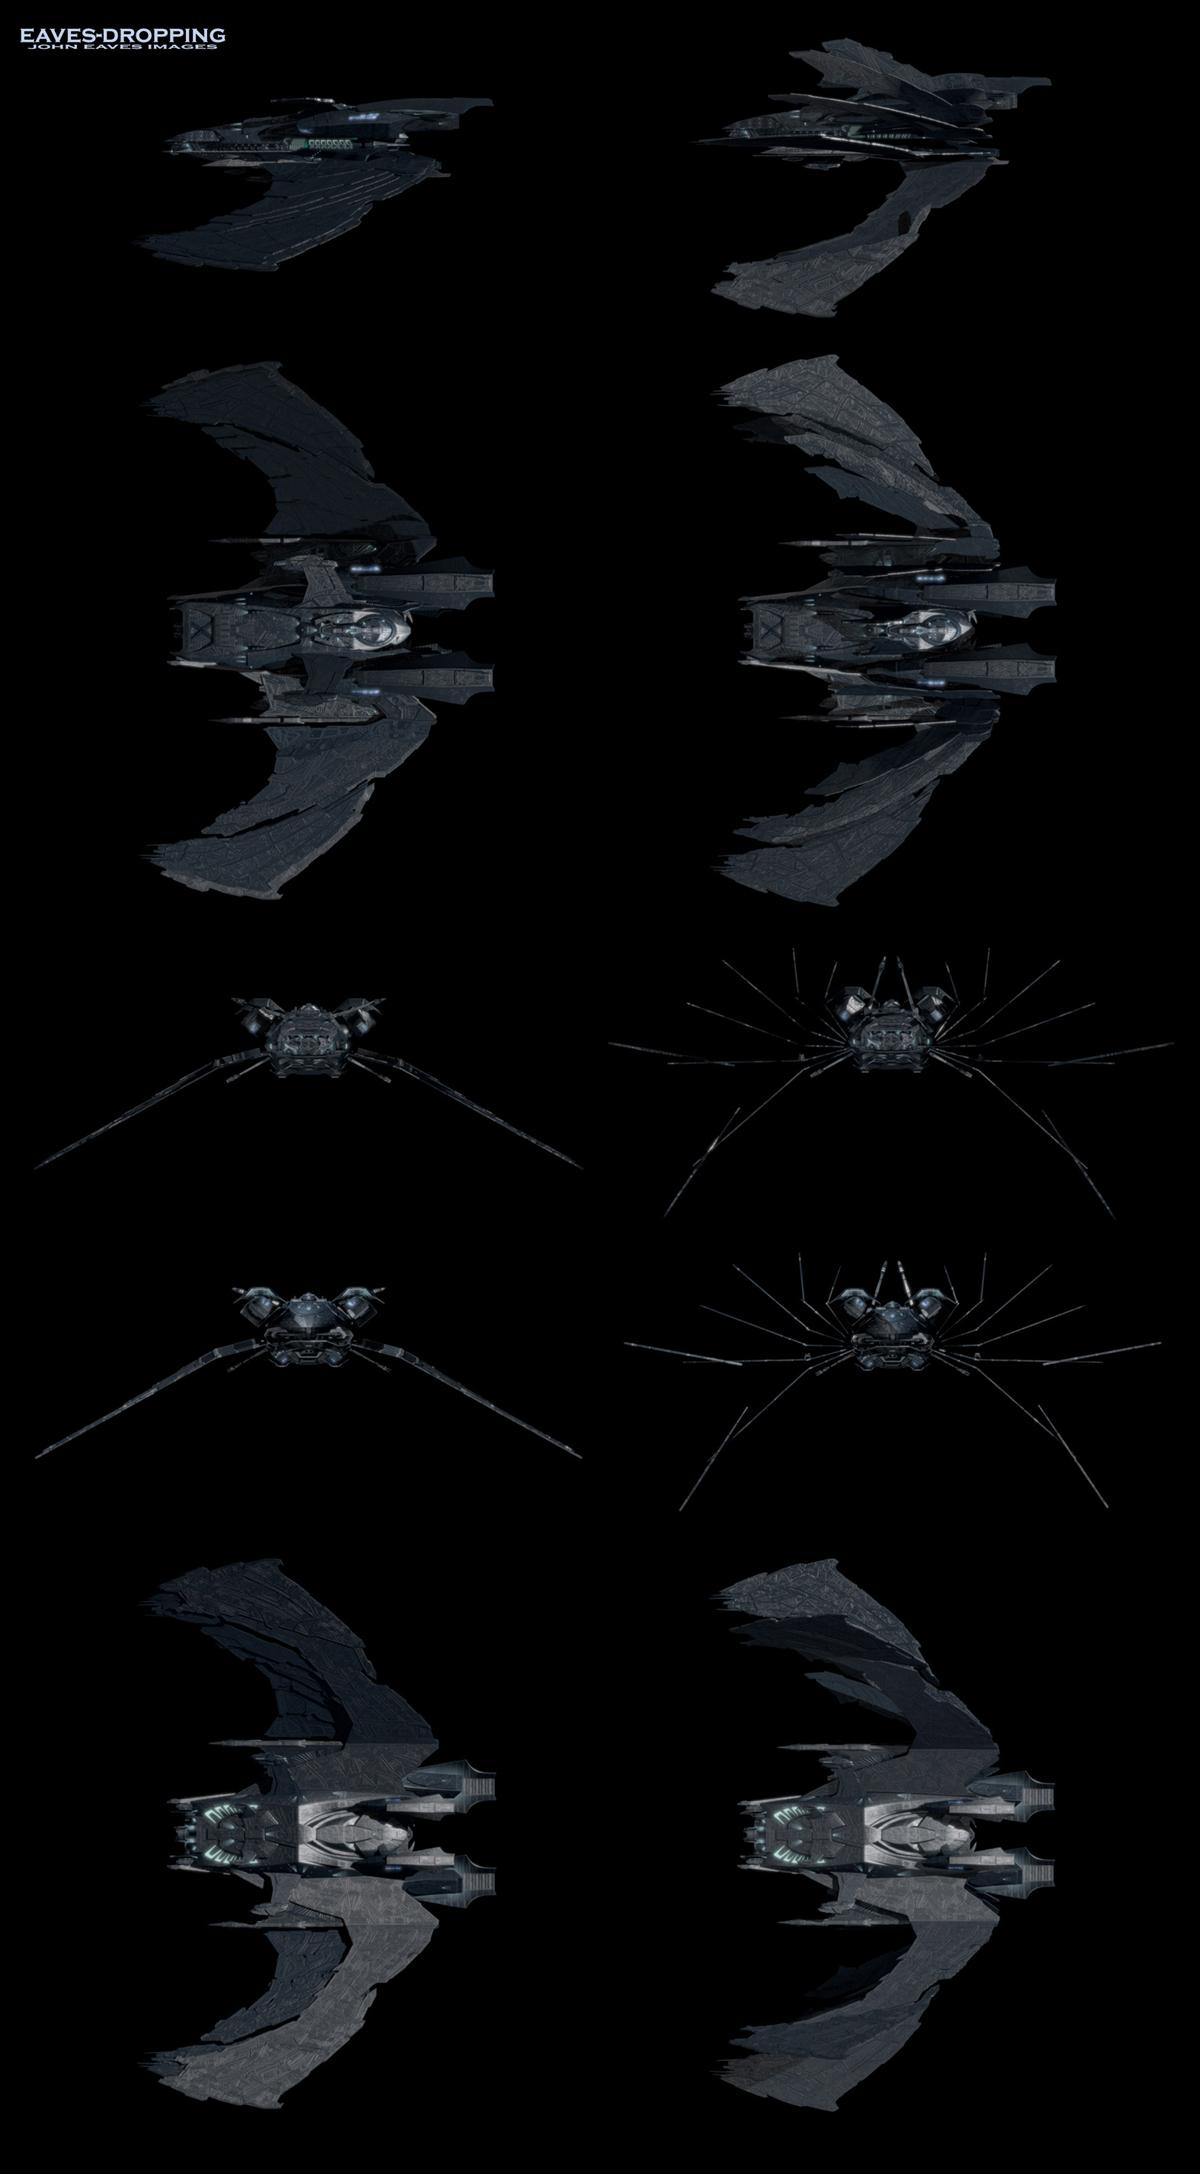 Starship Schematic Database - Romulan Star Empire - All Ships on